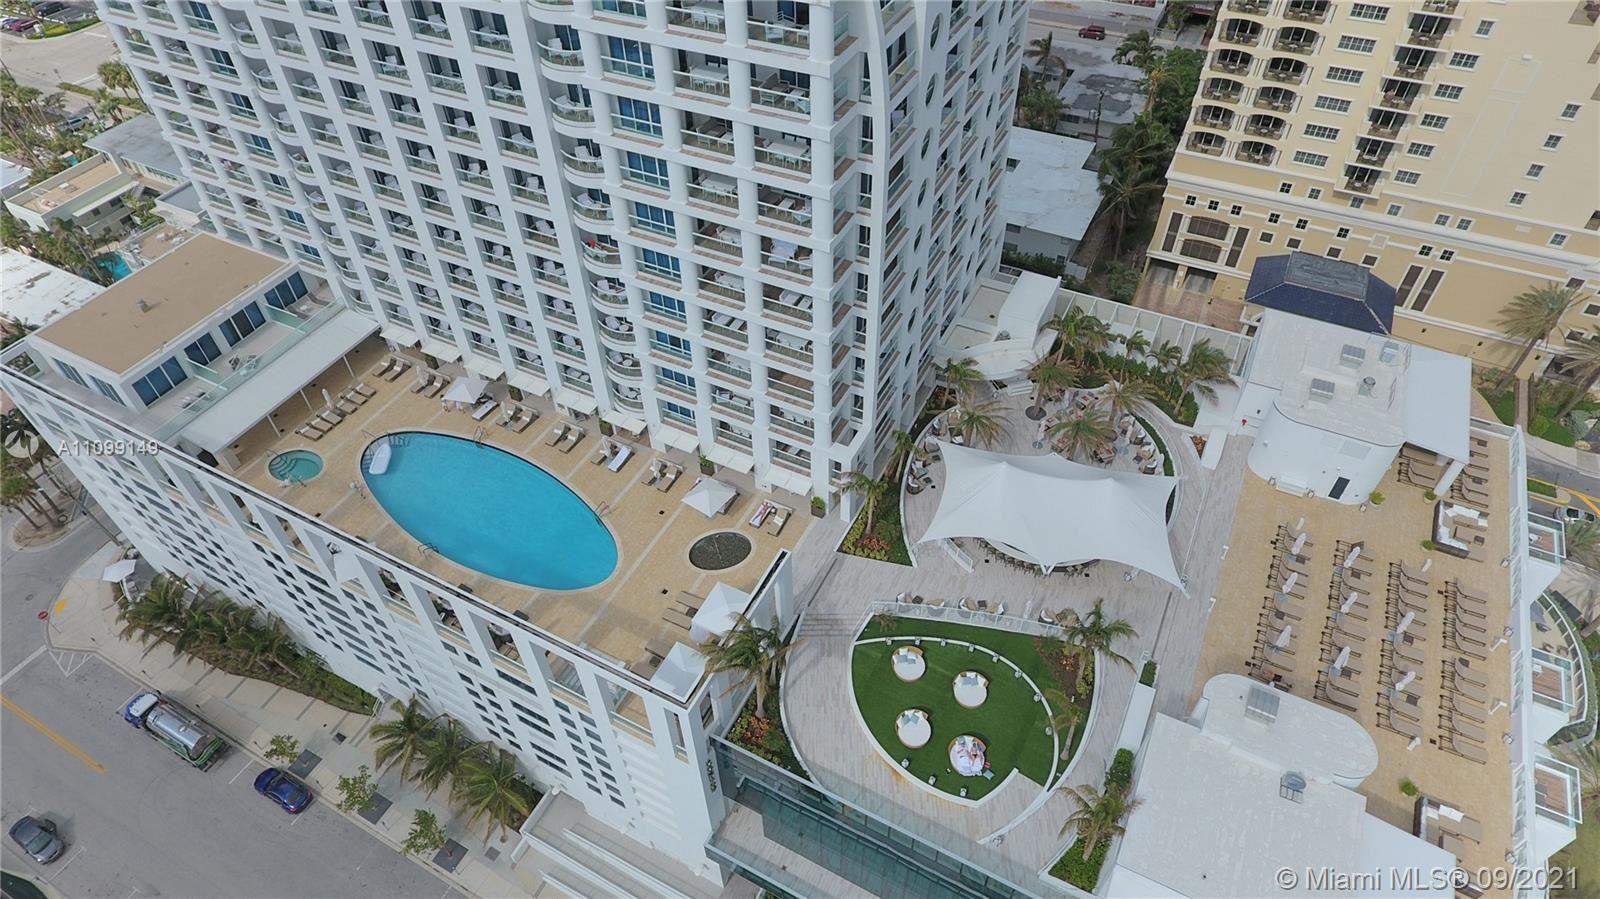 Photo of 551 N Fort Lauderdale Beach Blvd #H1015, Fort Lauderdale, FL 33304 (MLS # A11099149)